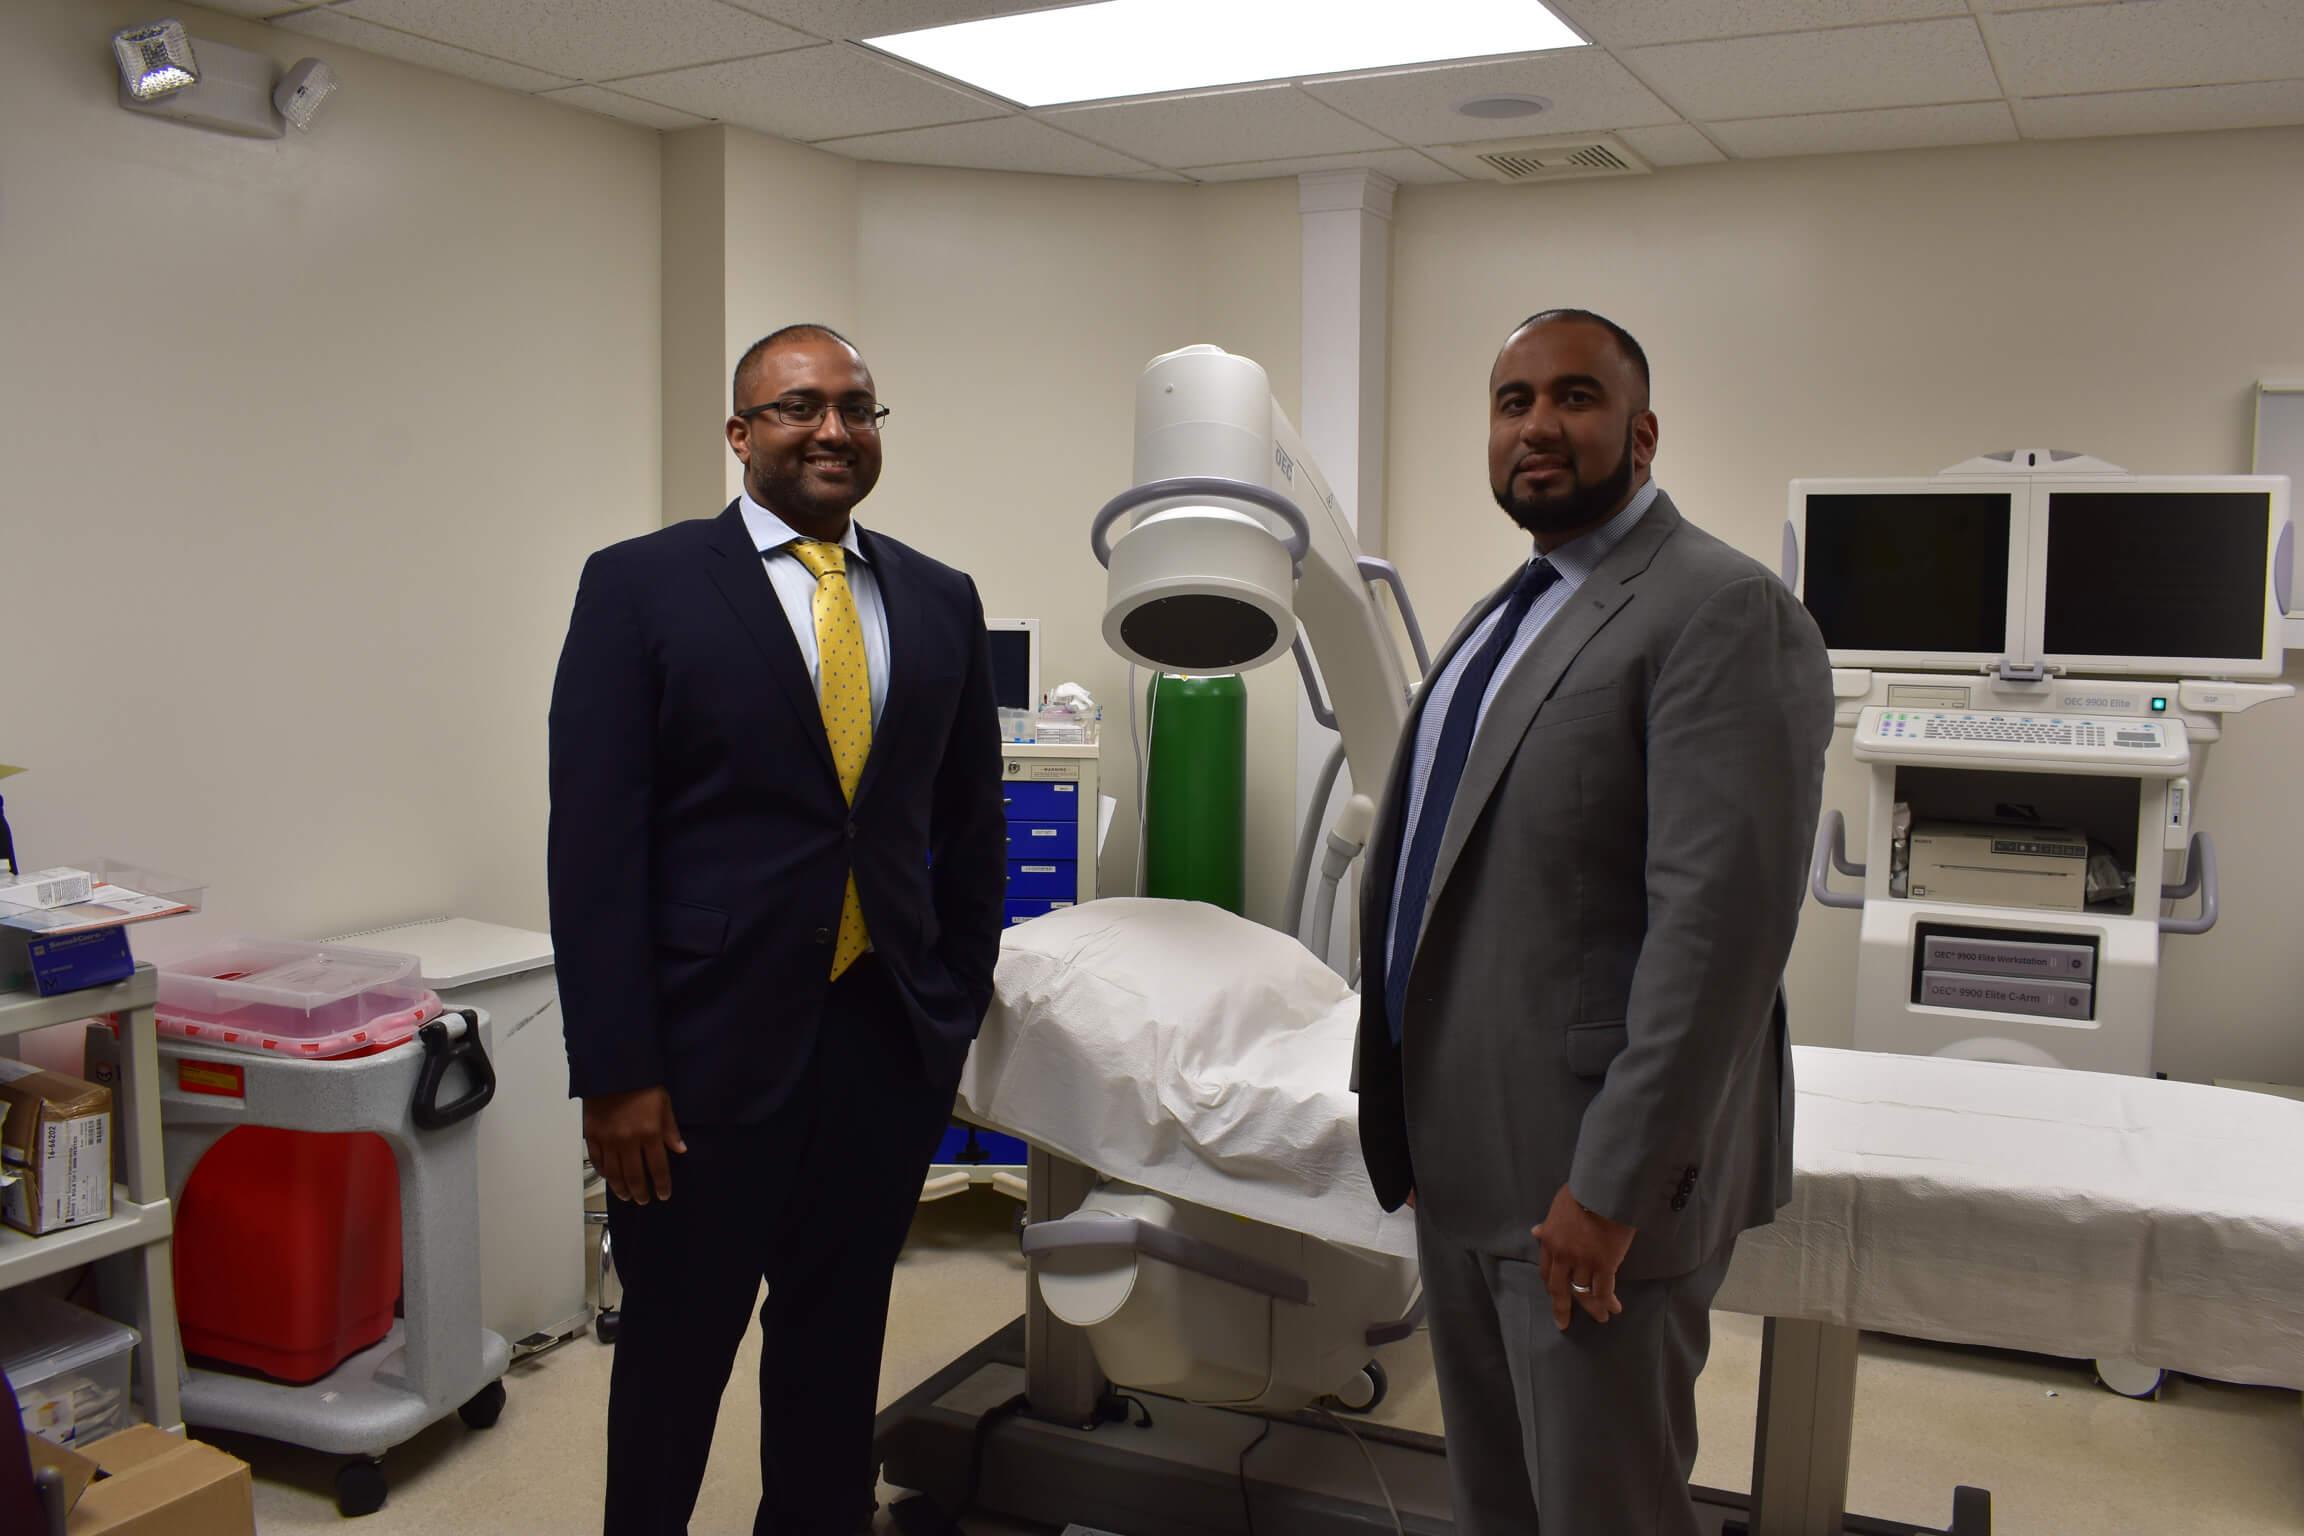 Dr. Abdussami Hadi and Dr. Mohammed Hadi of Hadi Medical Group in Brooklyn, NY